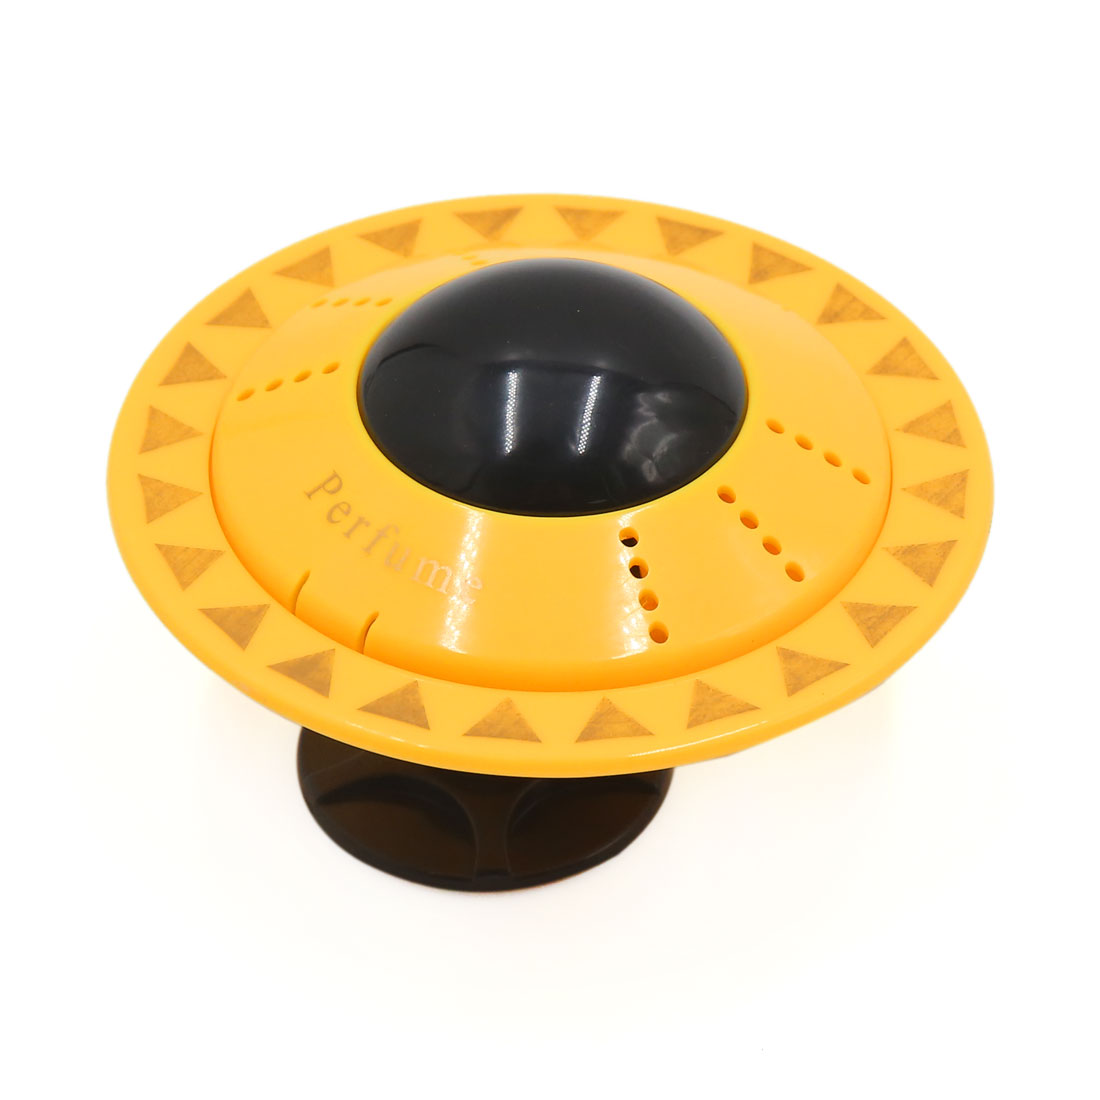 Yellow UFO Shaped Design Car Perfume Block Fragrance Diffuser Air Freshener